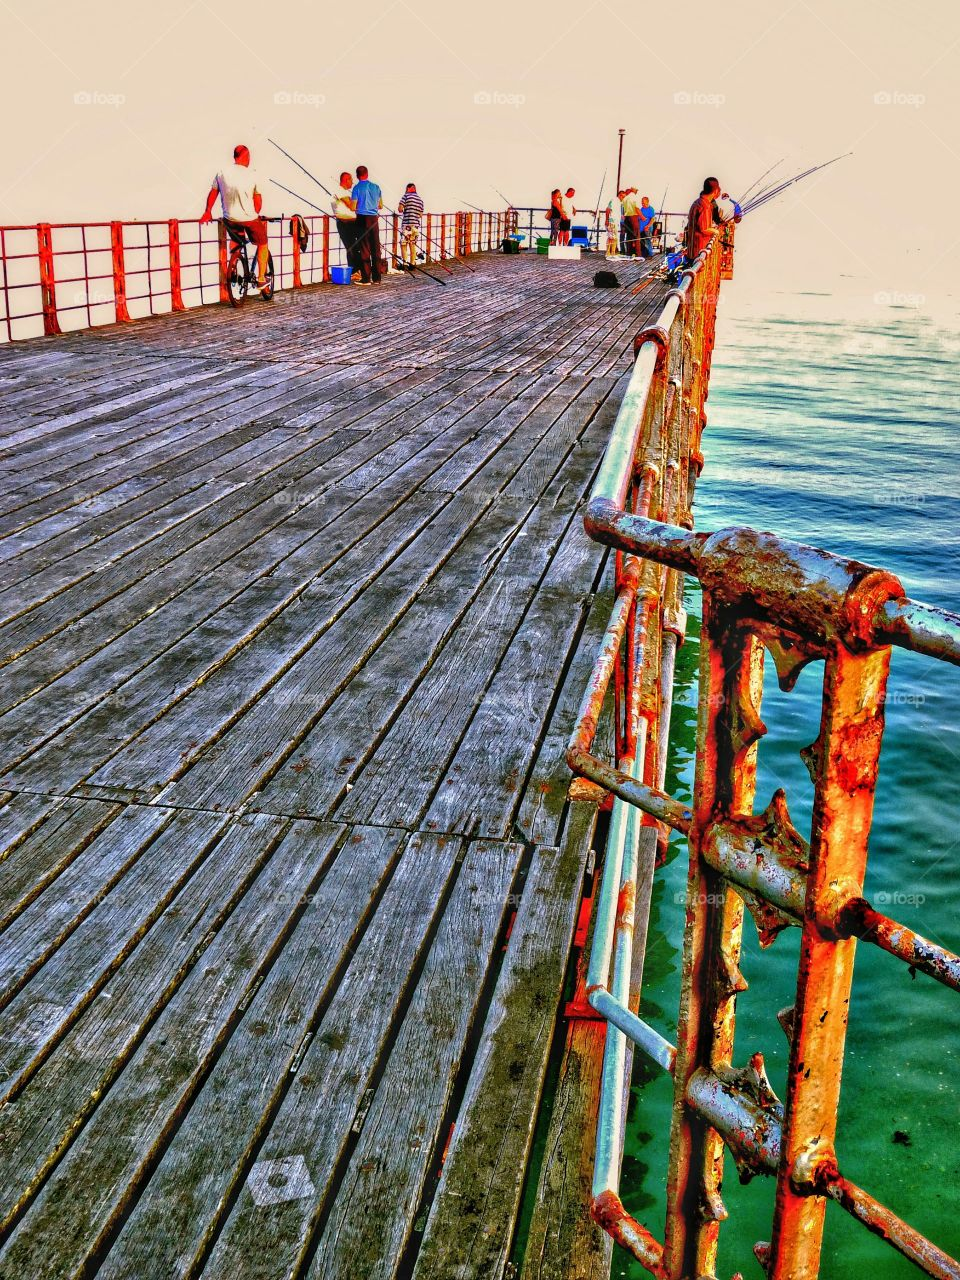 Bognar Regis Pier at Sunset